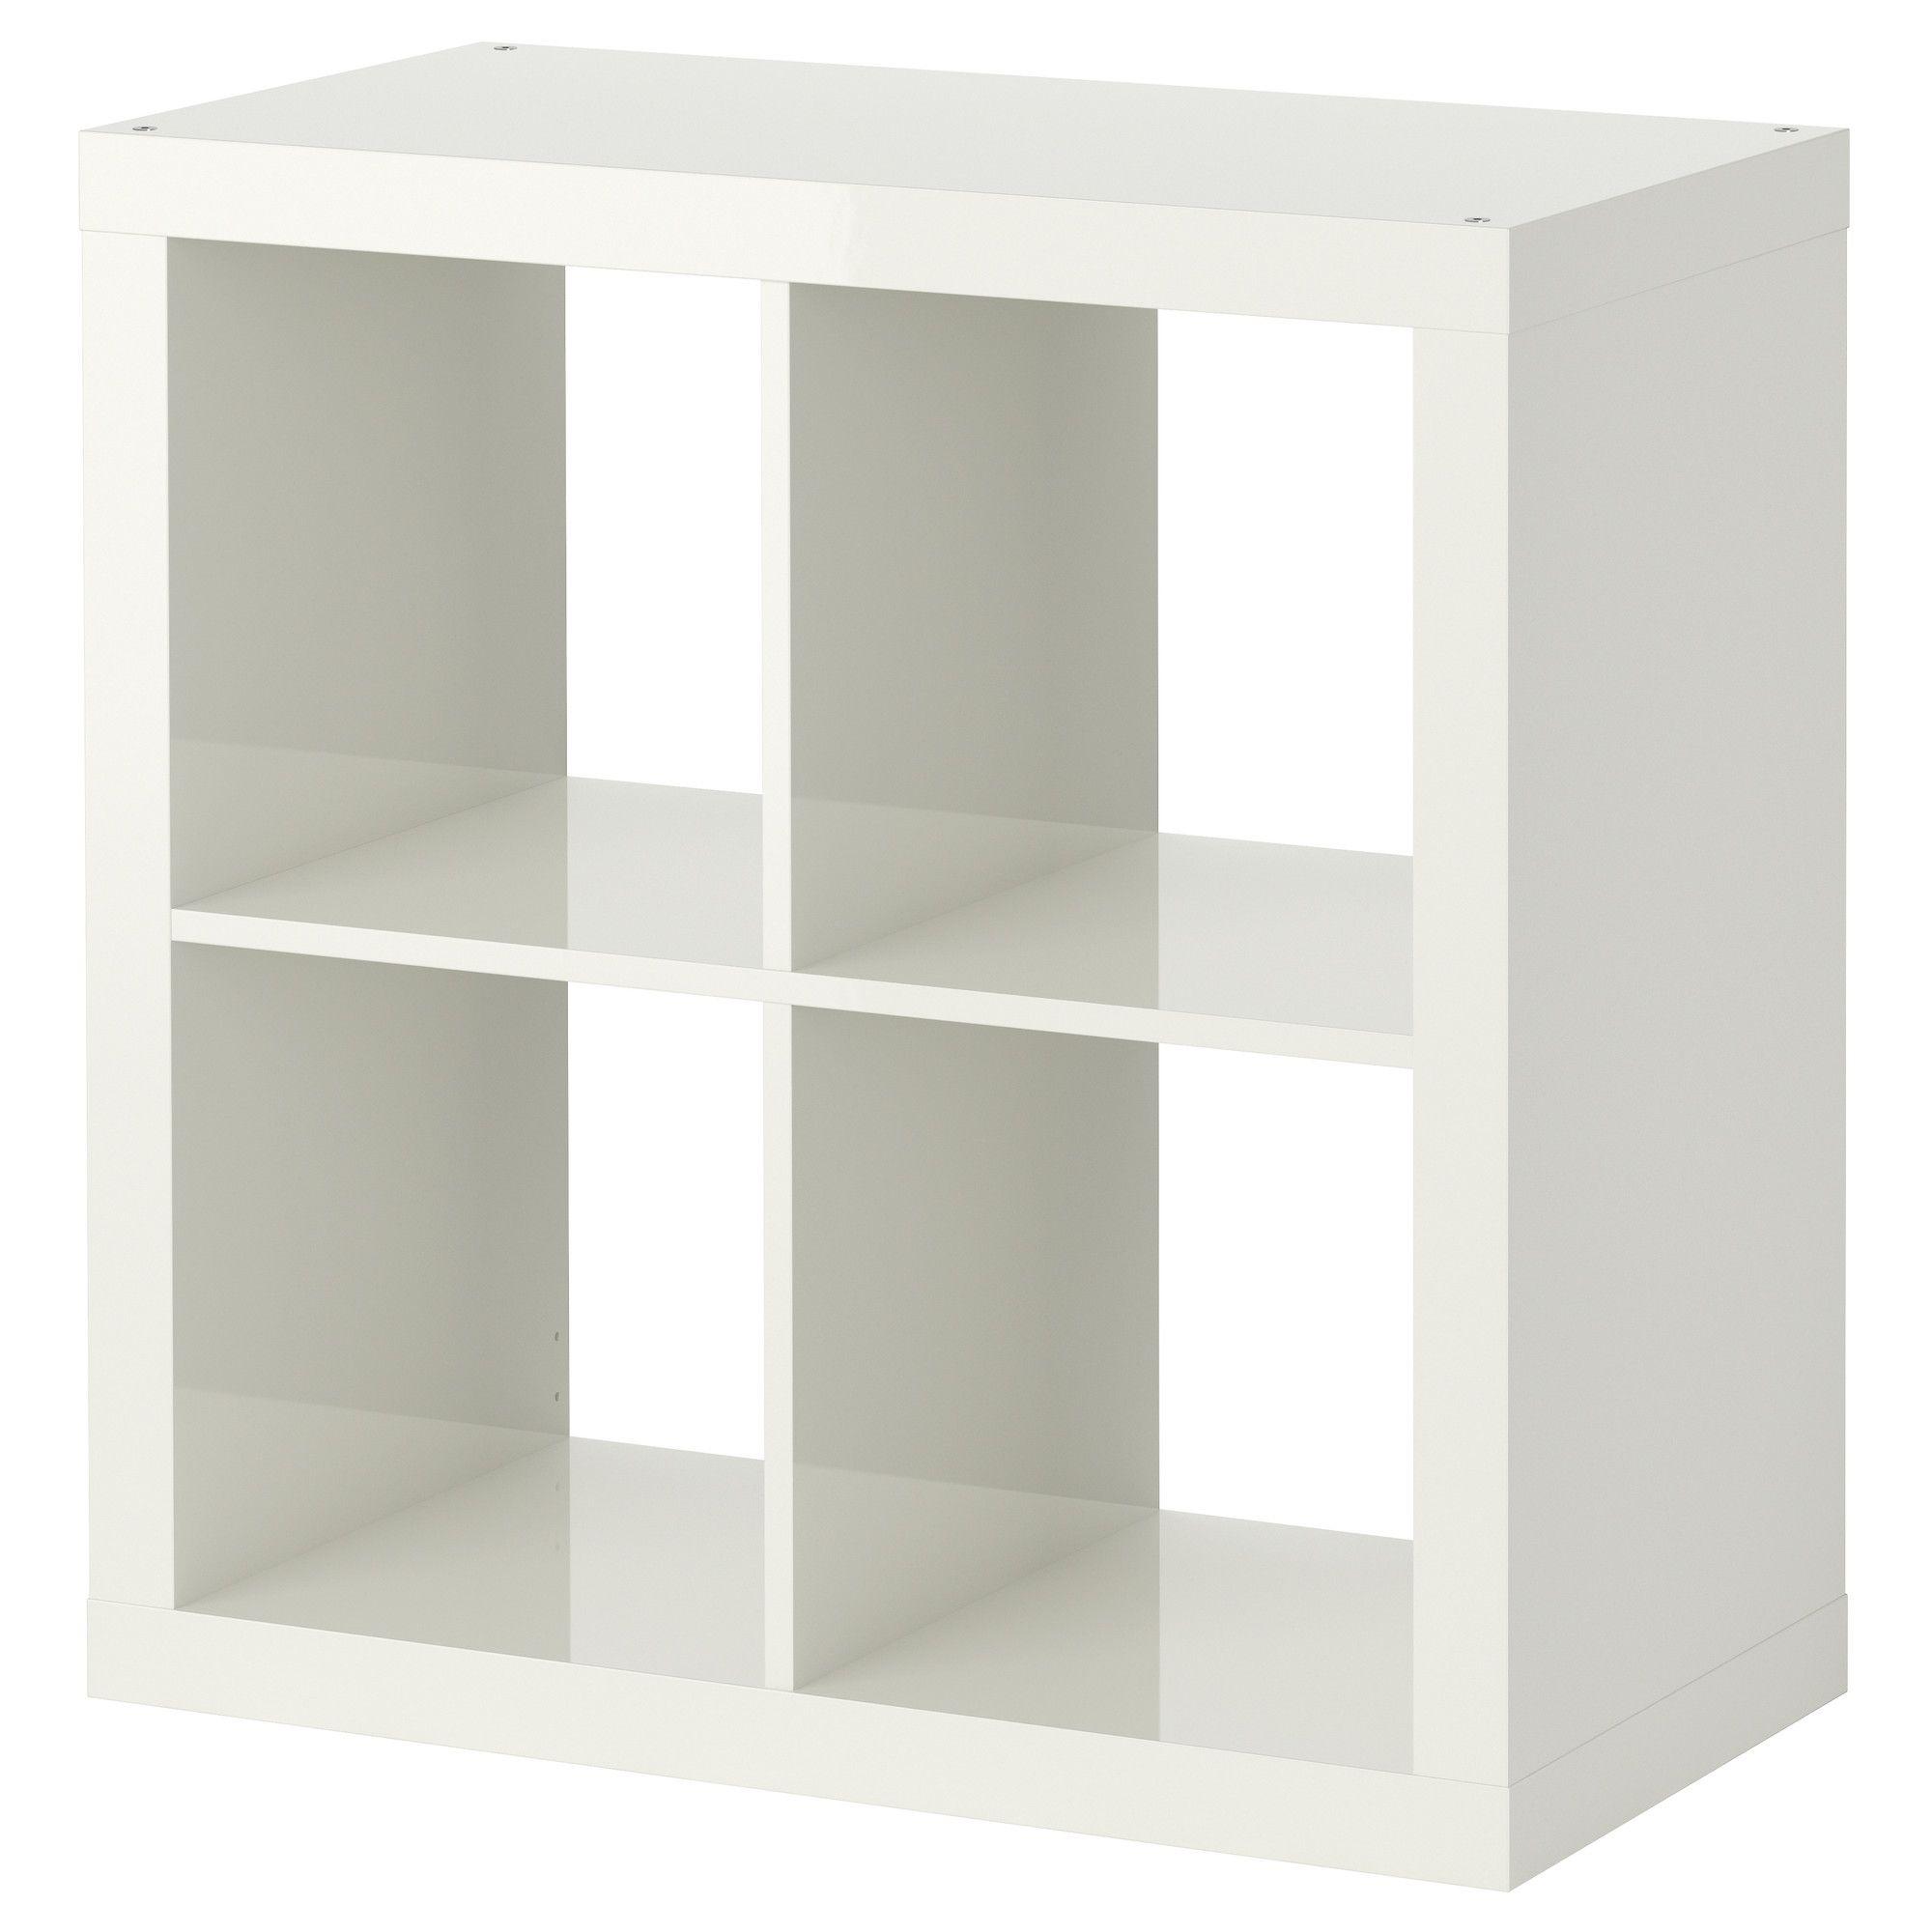 IKEA US Furniture and Home Furnishings | Ikea kallax